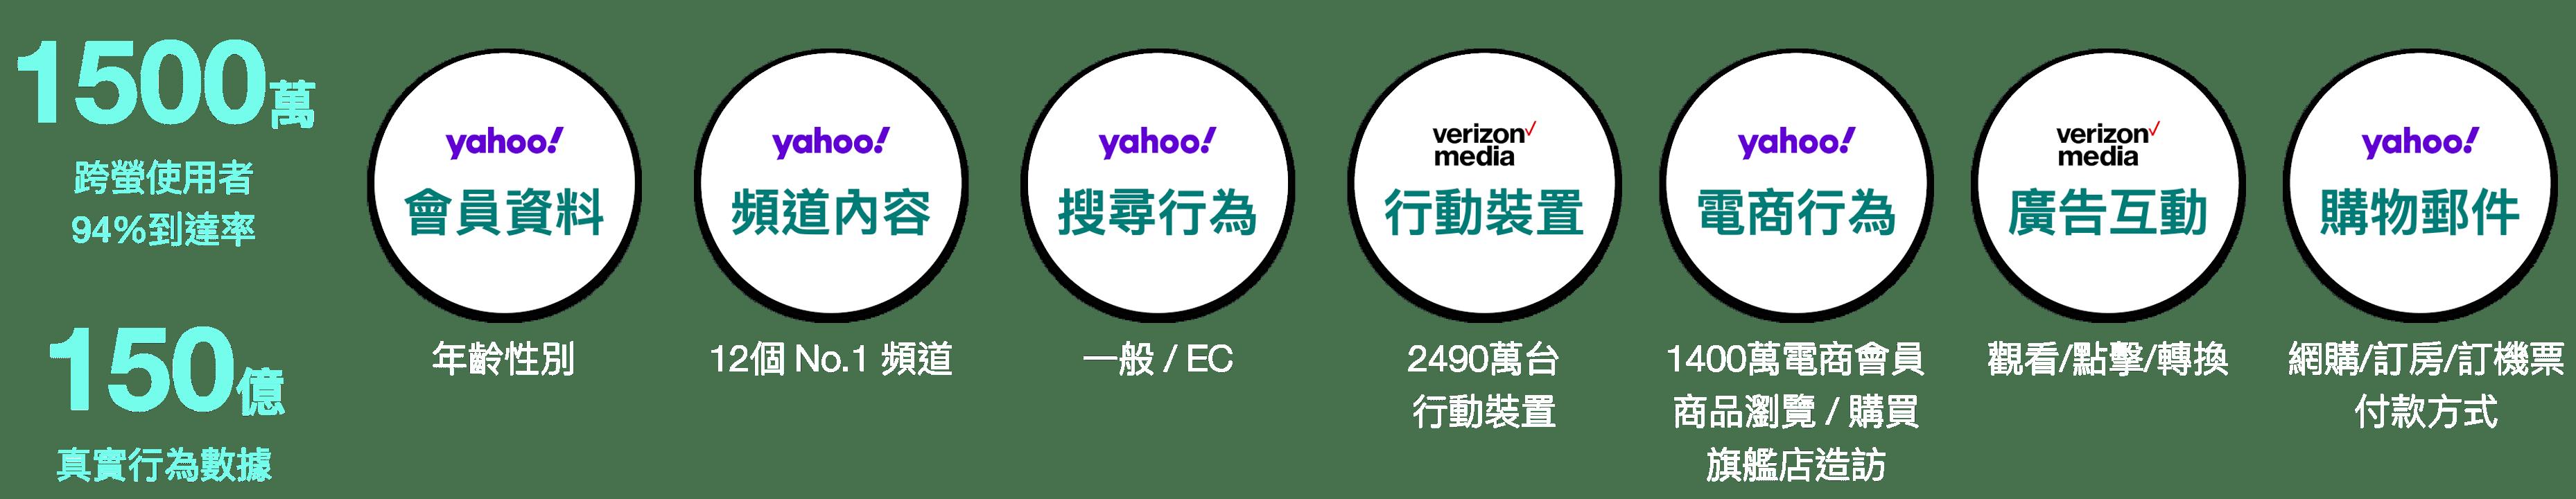 Yahoo廣告